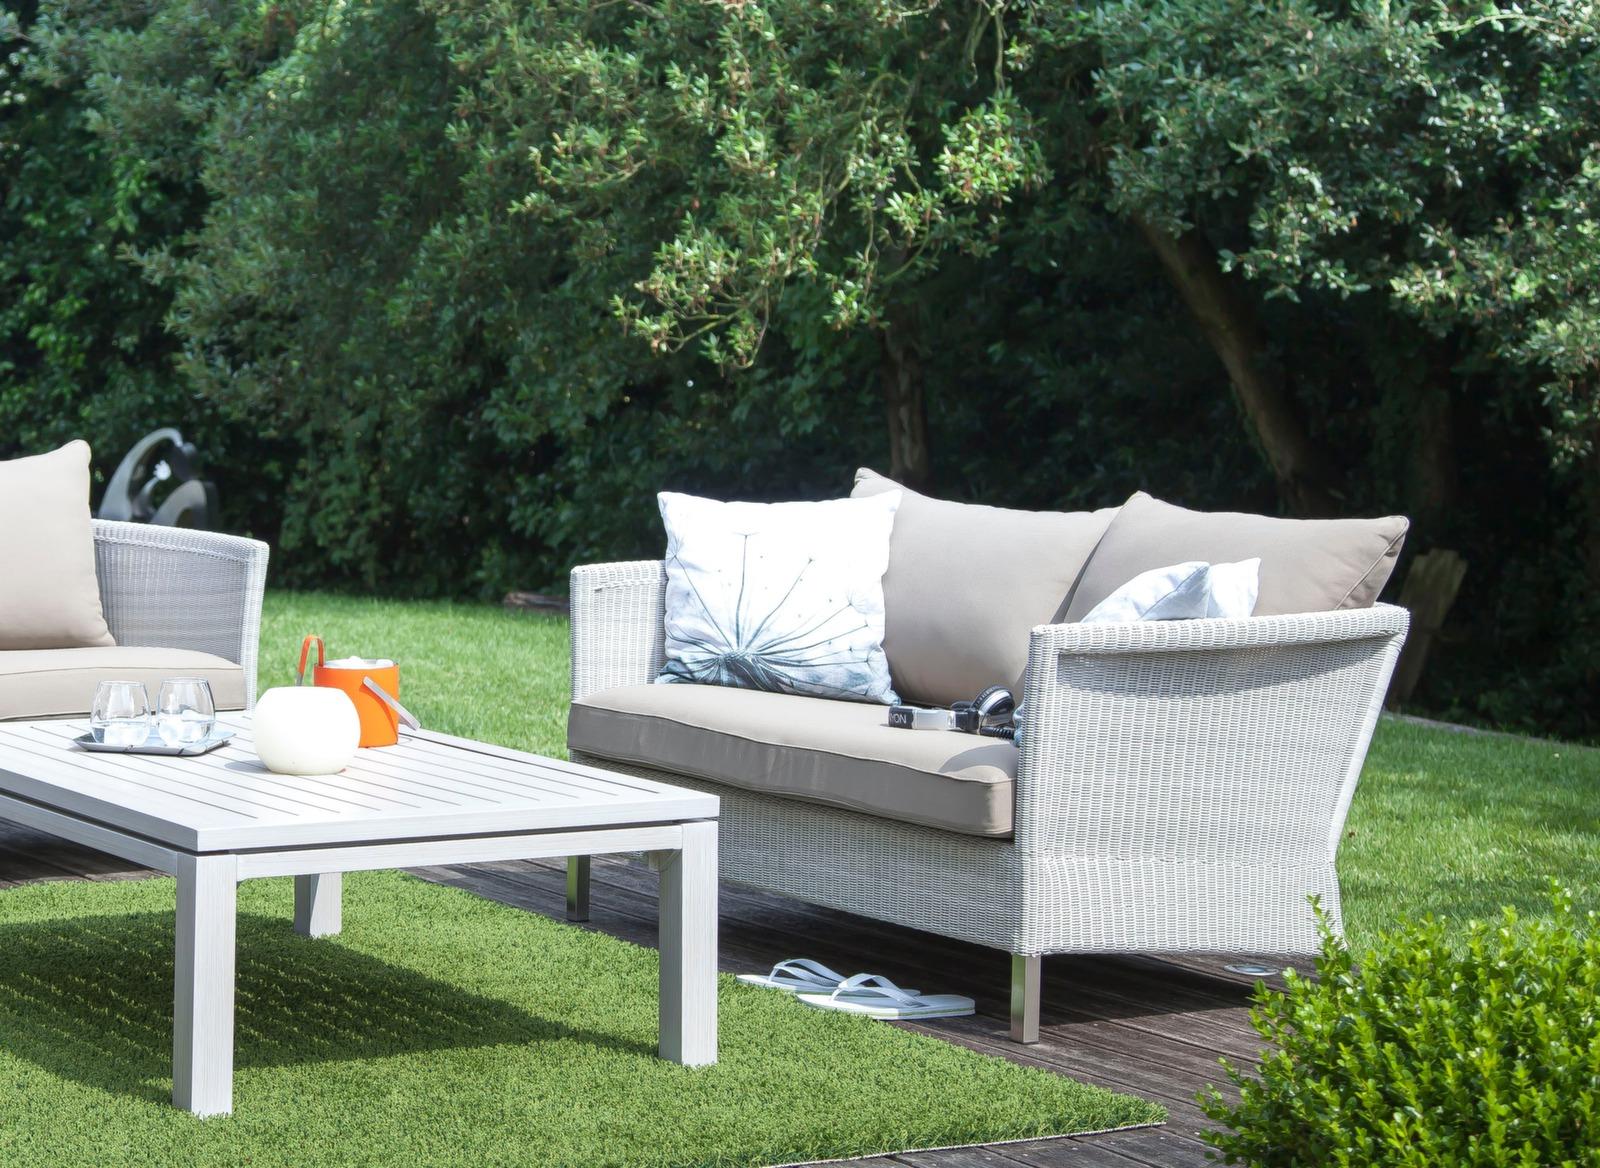 canap de jardin 2 places coussins thyme gamme oc o proloisirs. Black Bedroom Furniture Sets. Home Design Ideas